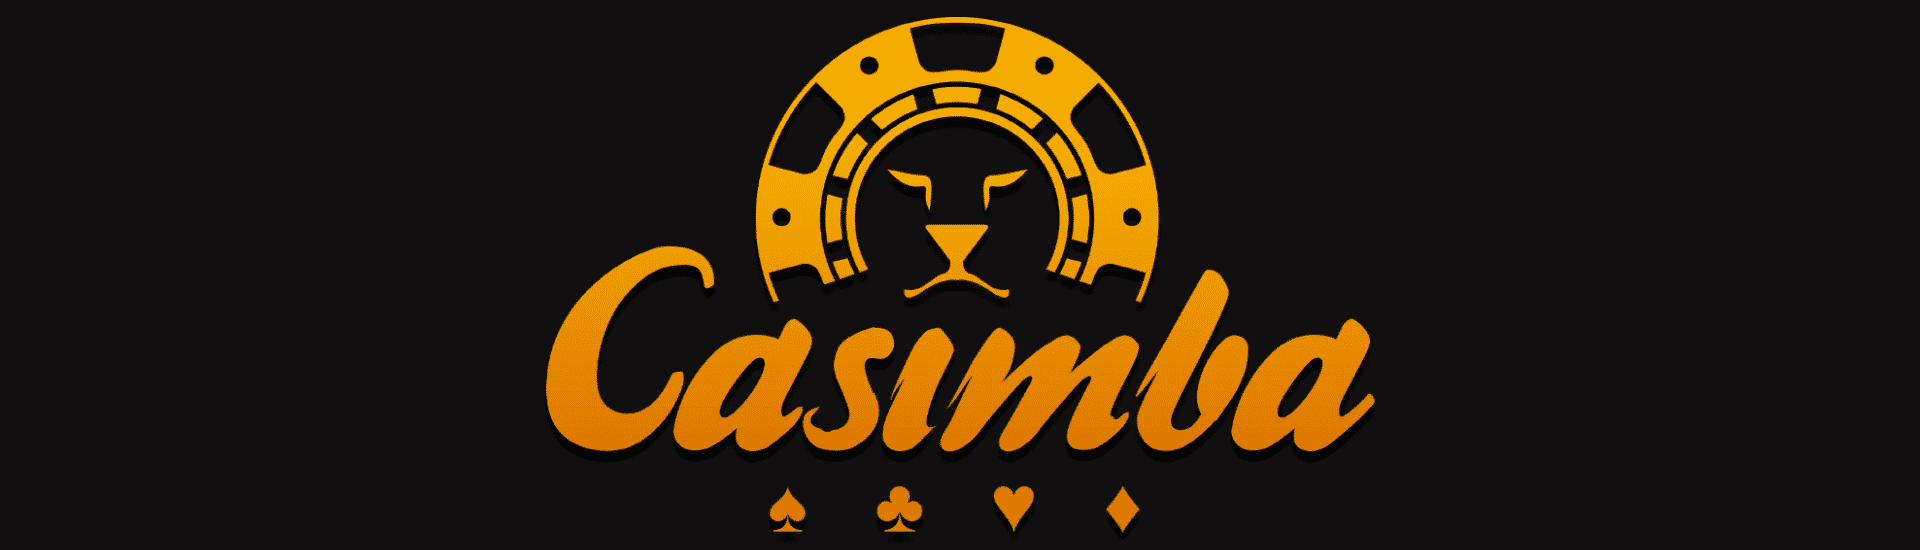 Casimba Featured Image